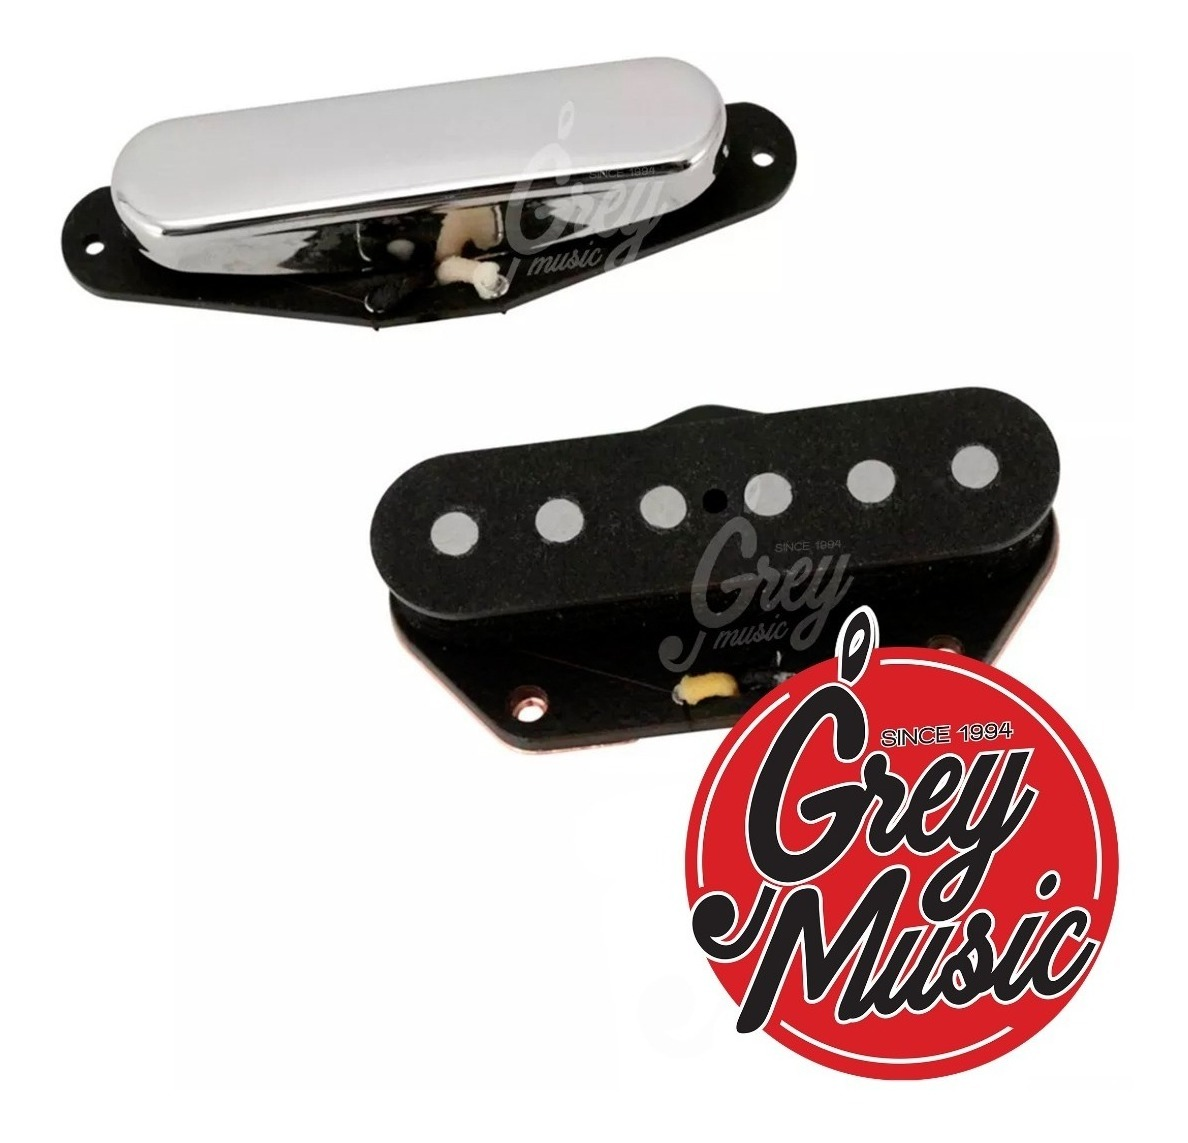 Microfonos Klein Epic Nocaster Telecaster Set Guitarra Grey